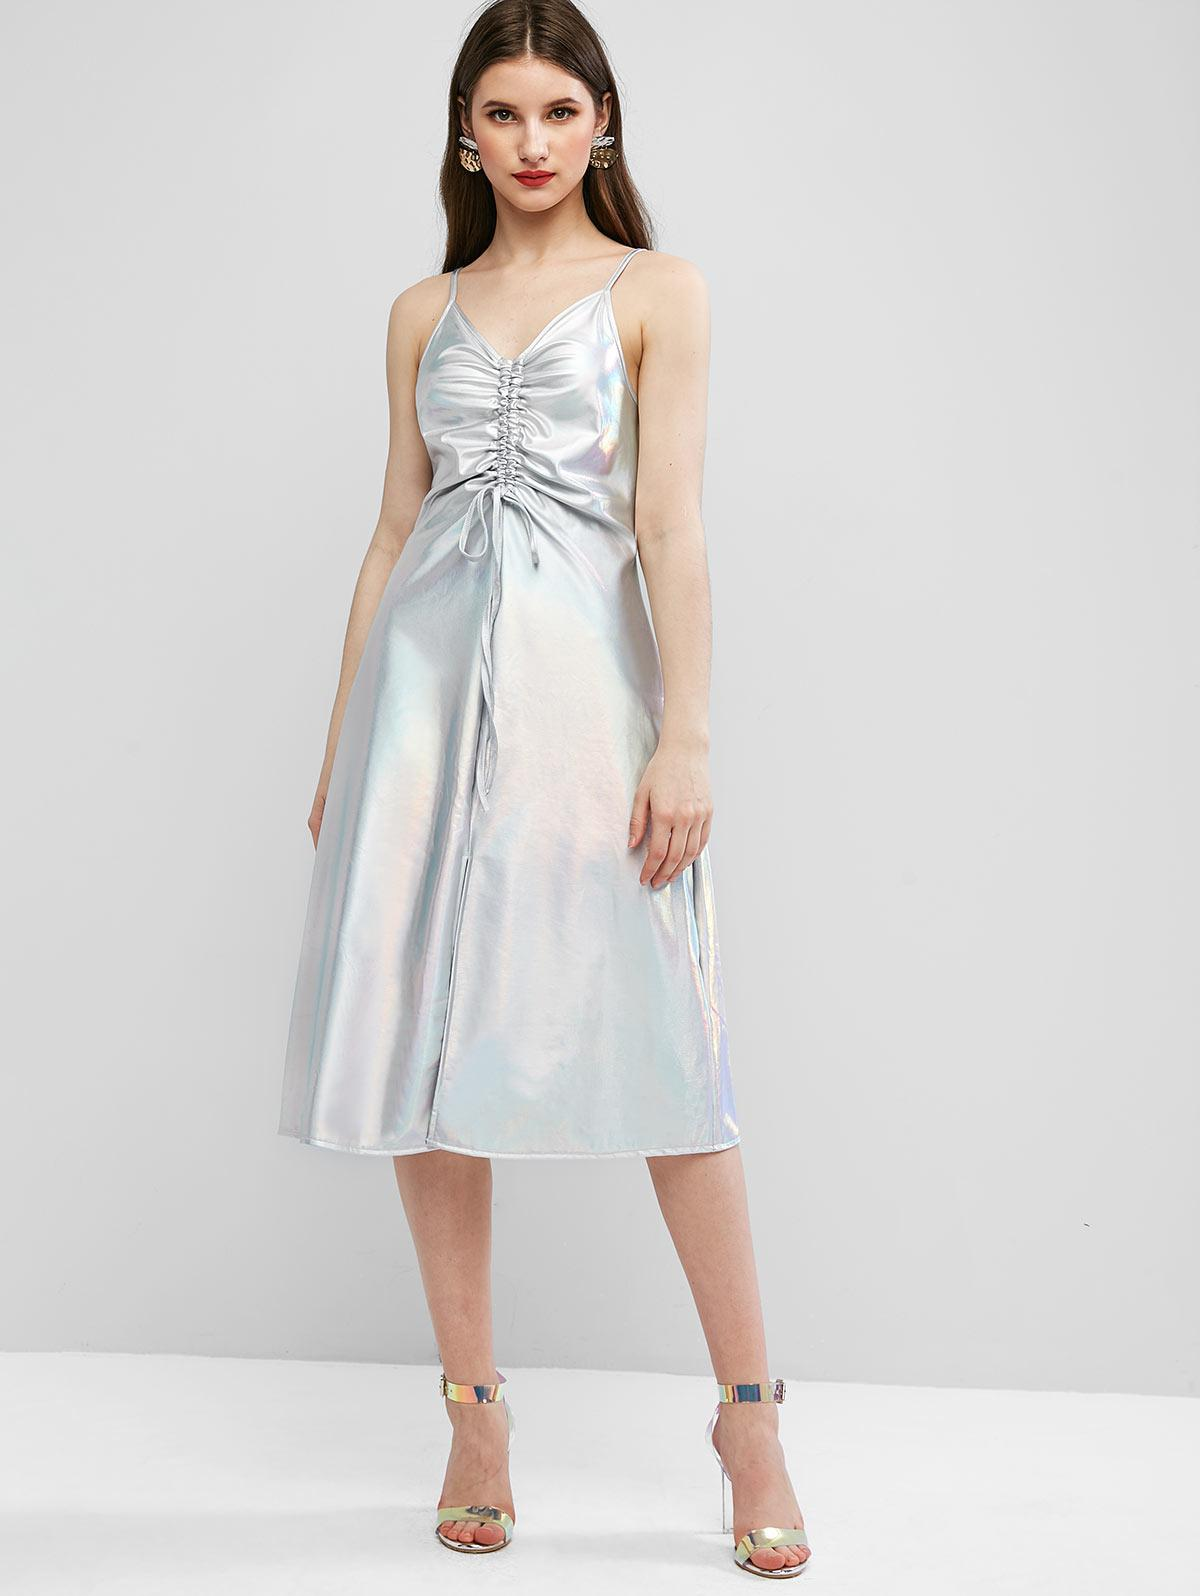 ZAFUL Sparkle Shiny Cinched Front Slit Cami Dress thumbnail